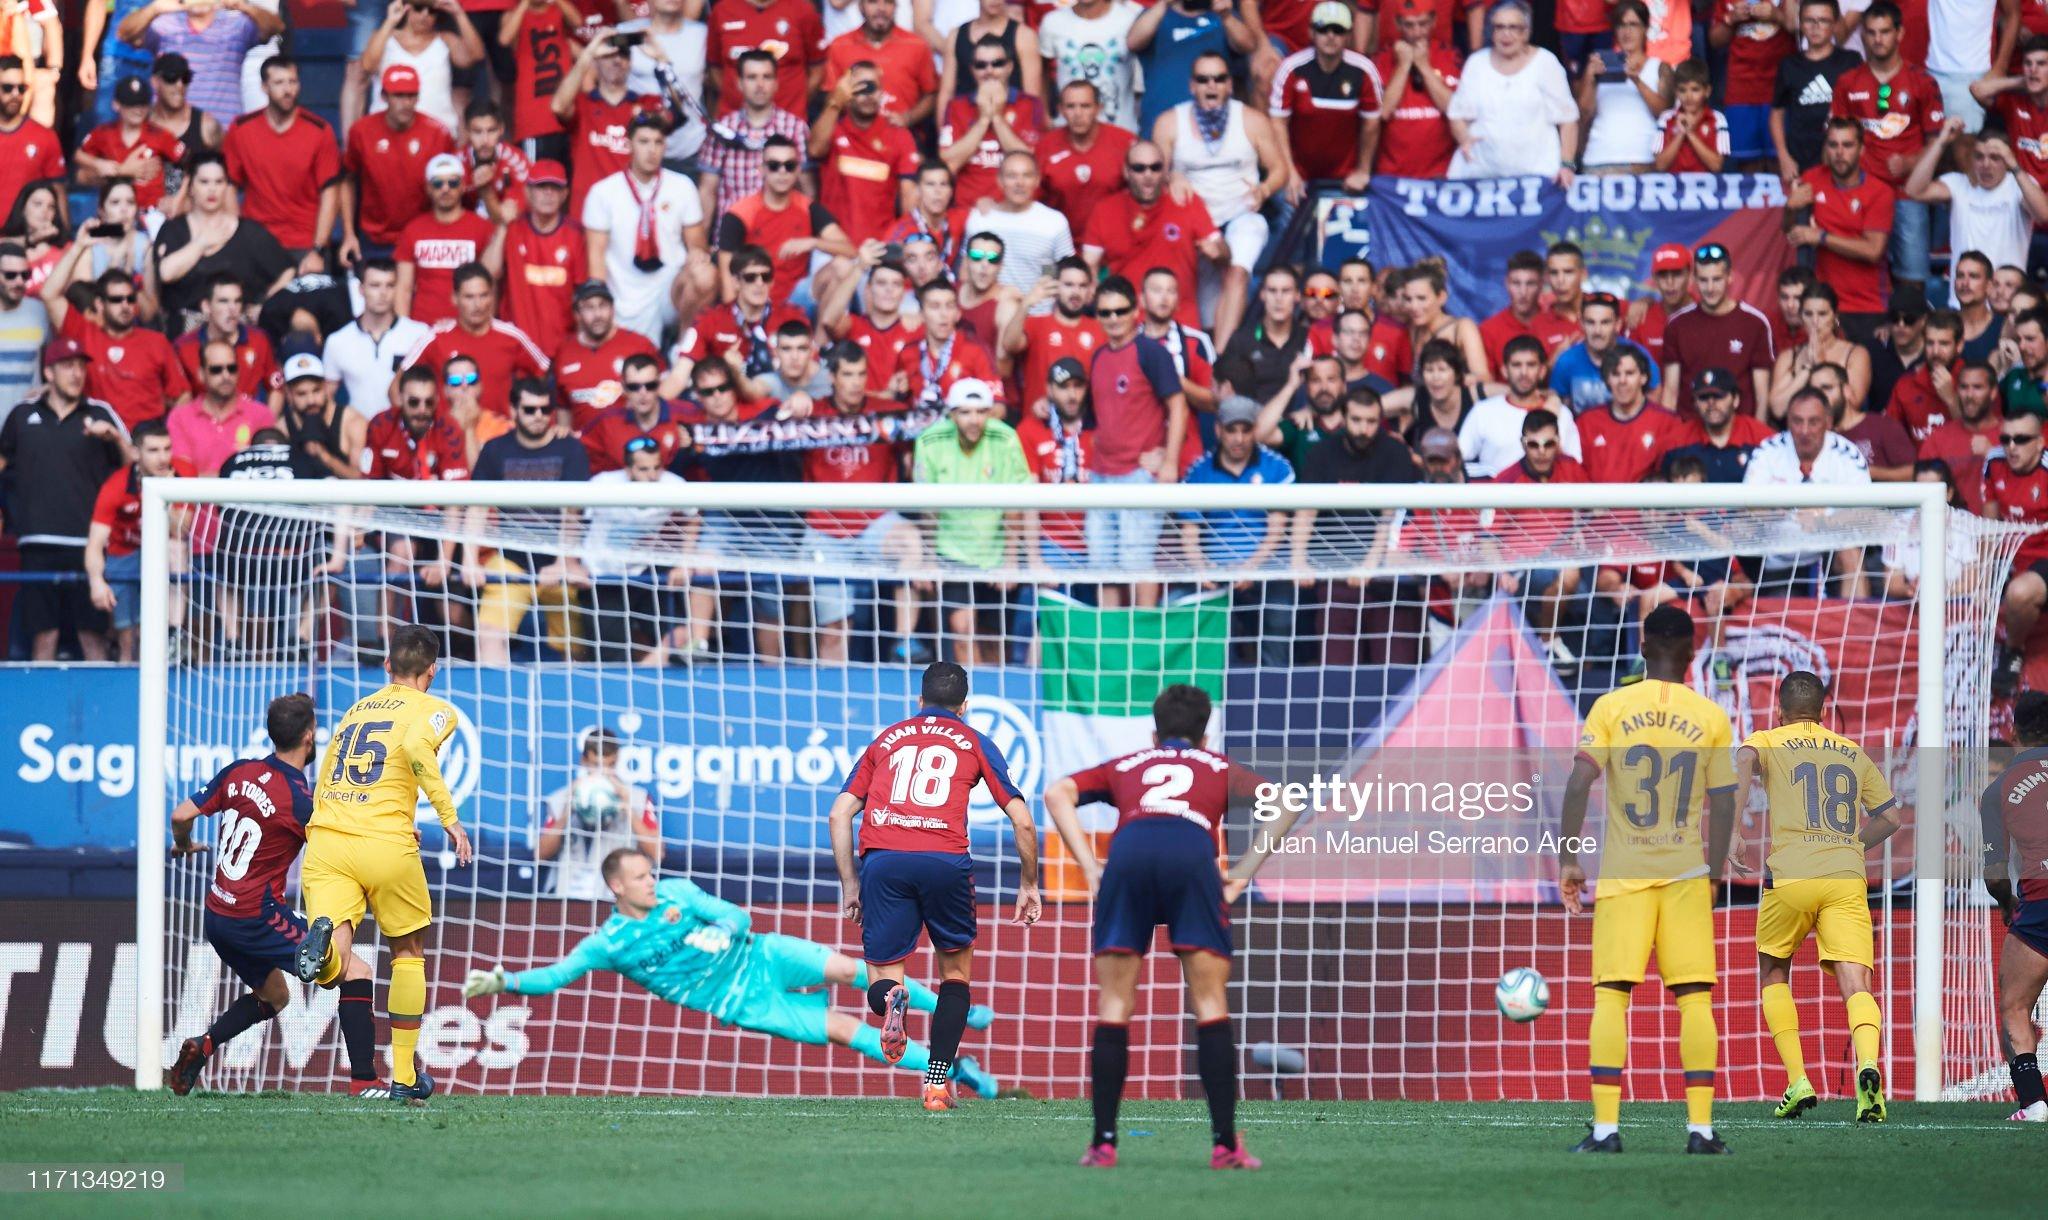 صور مباراة : أوساسونا - برشلونة 2-2 ( 31-08-2019 )  Roberto-torres-of-ca-osasuna-scores-his-teams-second-goal-during-the-picture-id1171349219?s=2048x2048